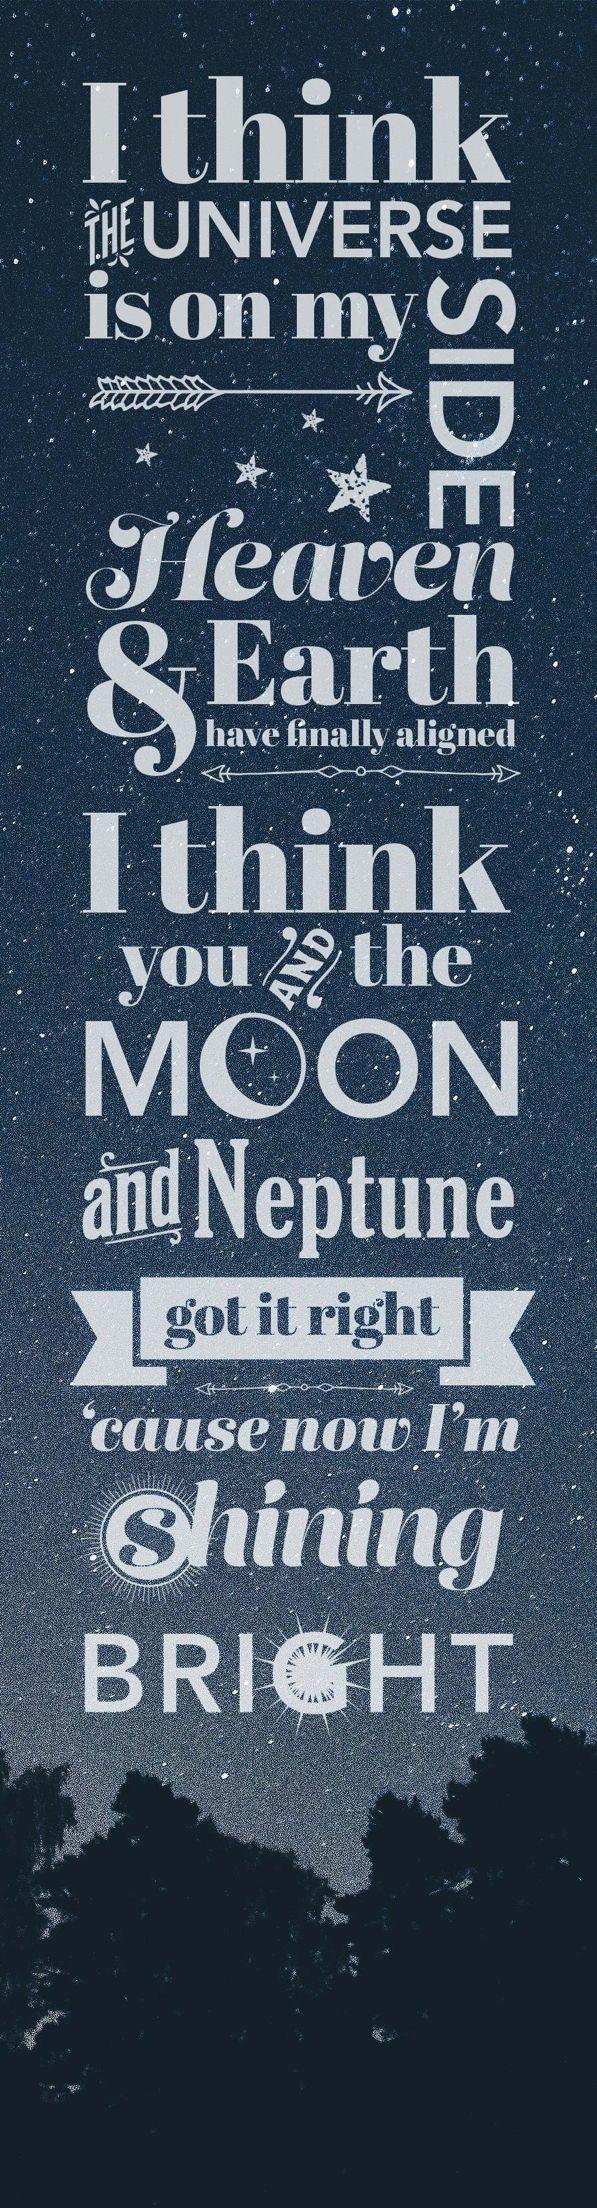 Bright by Echosmith :)